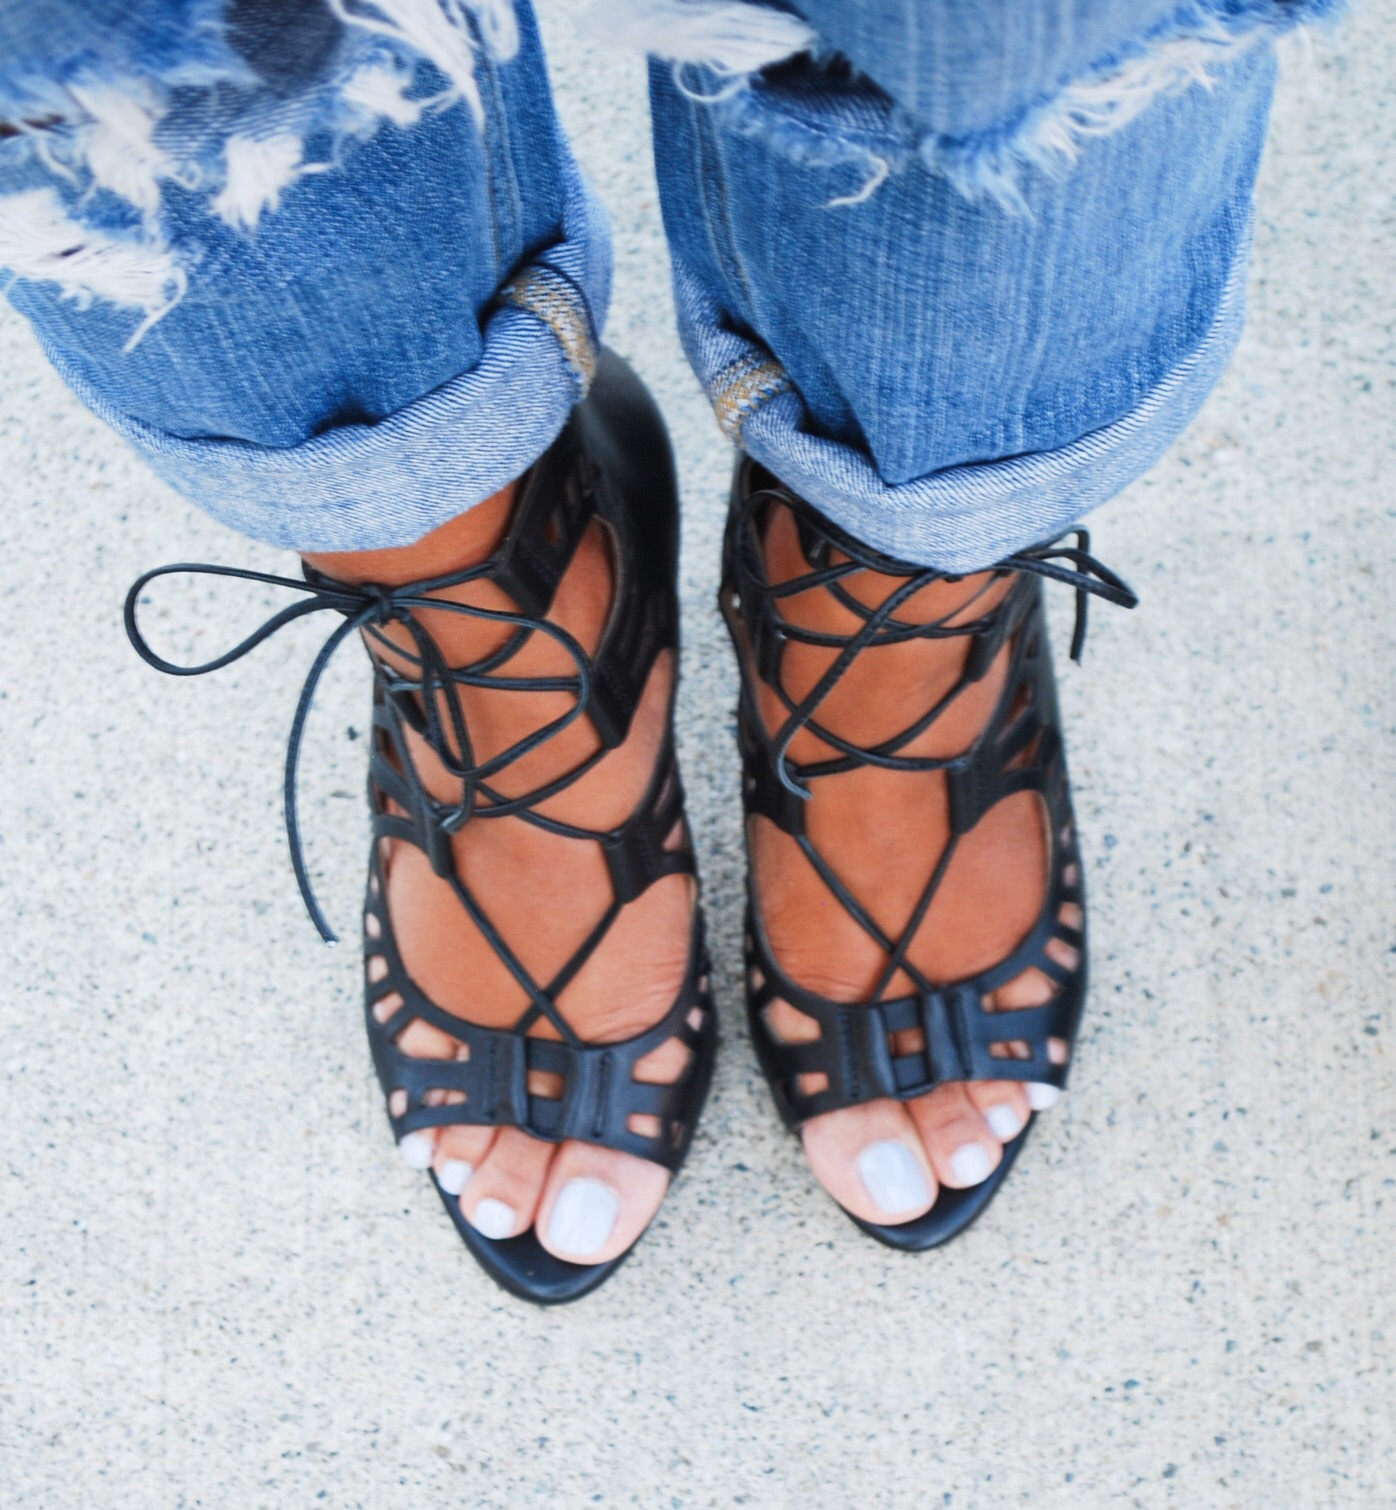 BCBG strappy heels